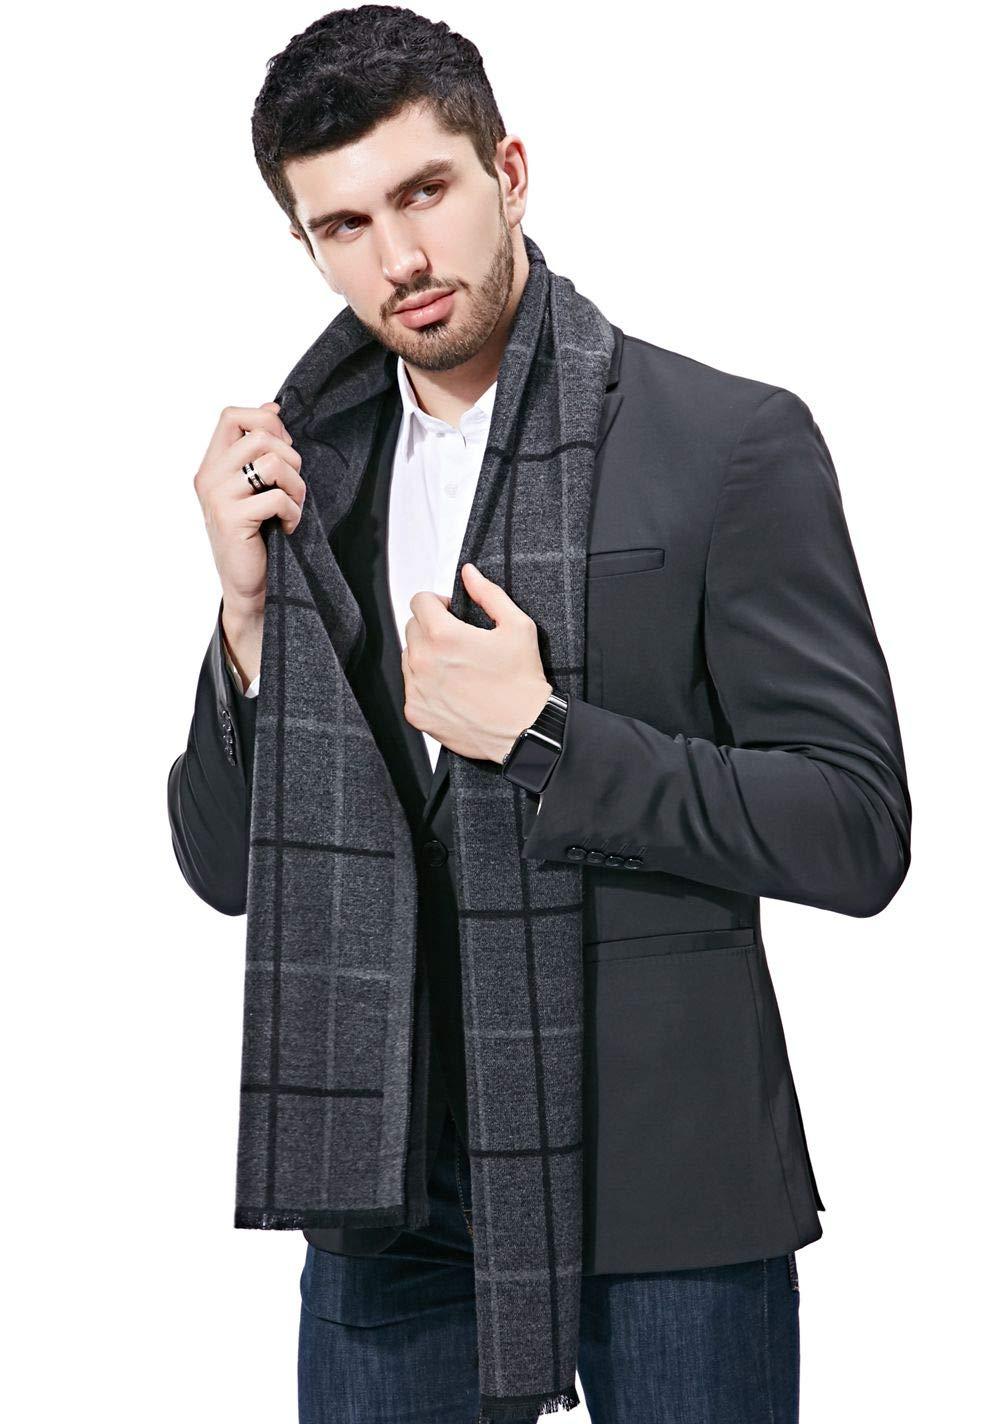 FULLRON Men Cashmere Scarf Long Warm Cotton Plaid Scarves(Grey, Black)